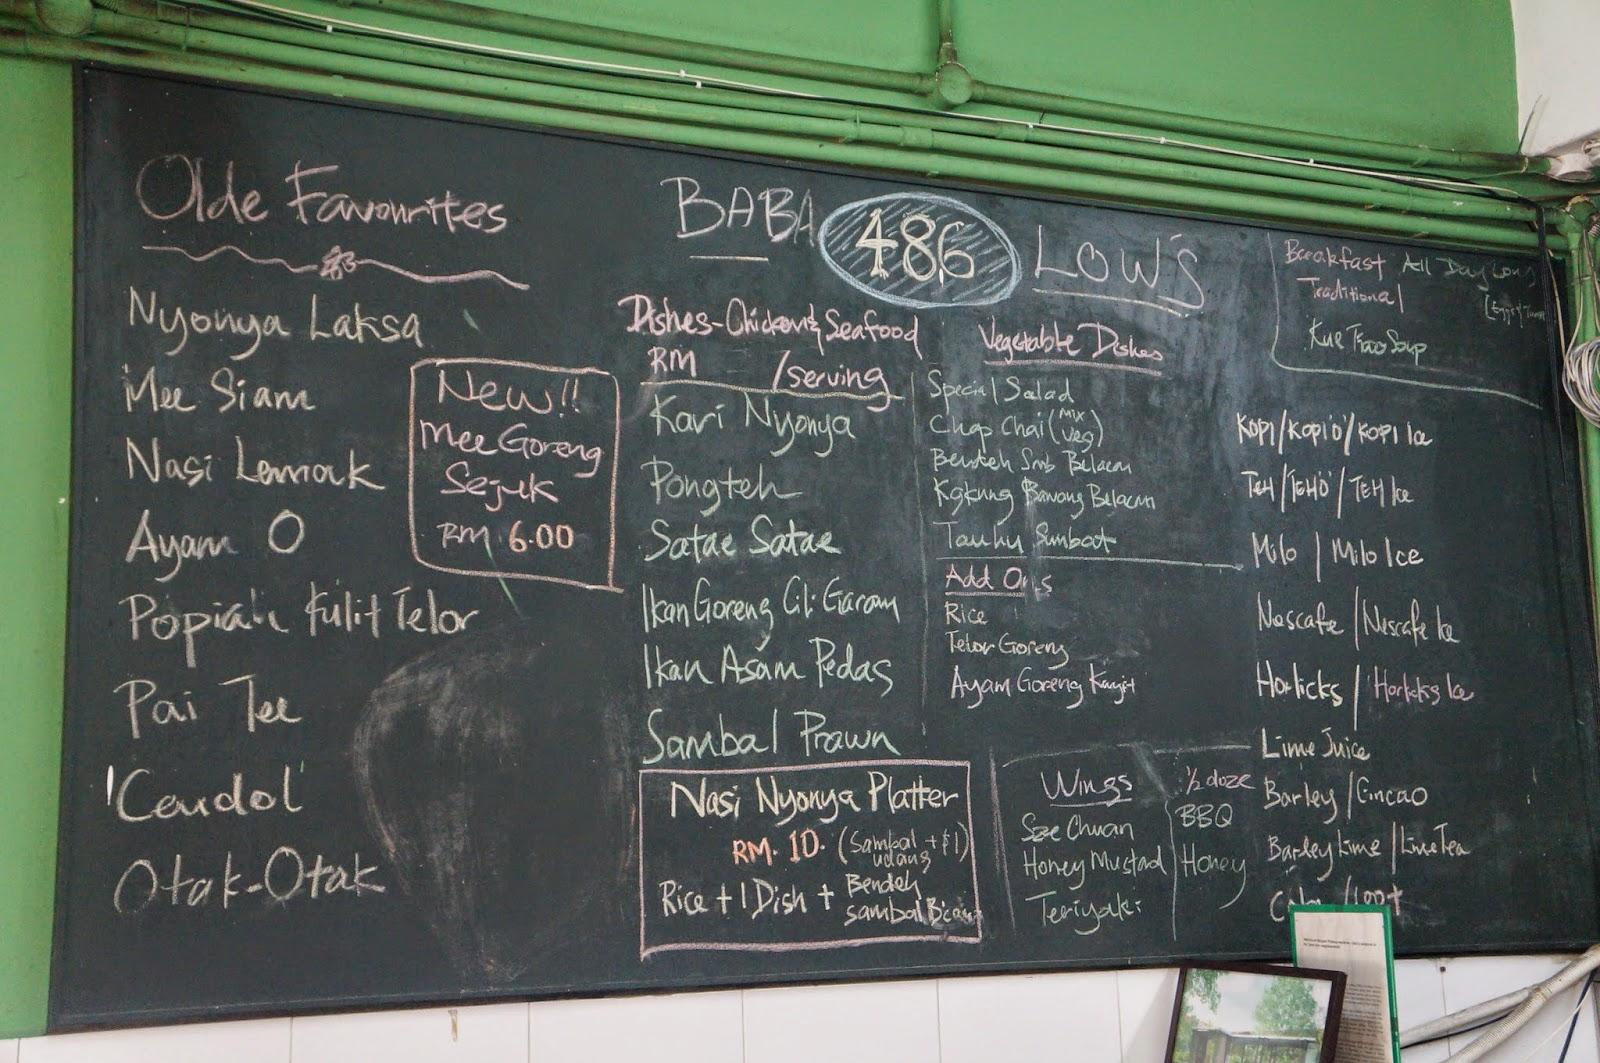 Baba Low's menu.